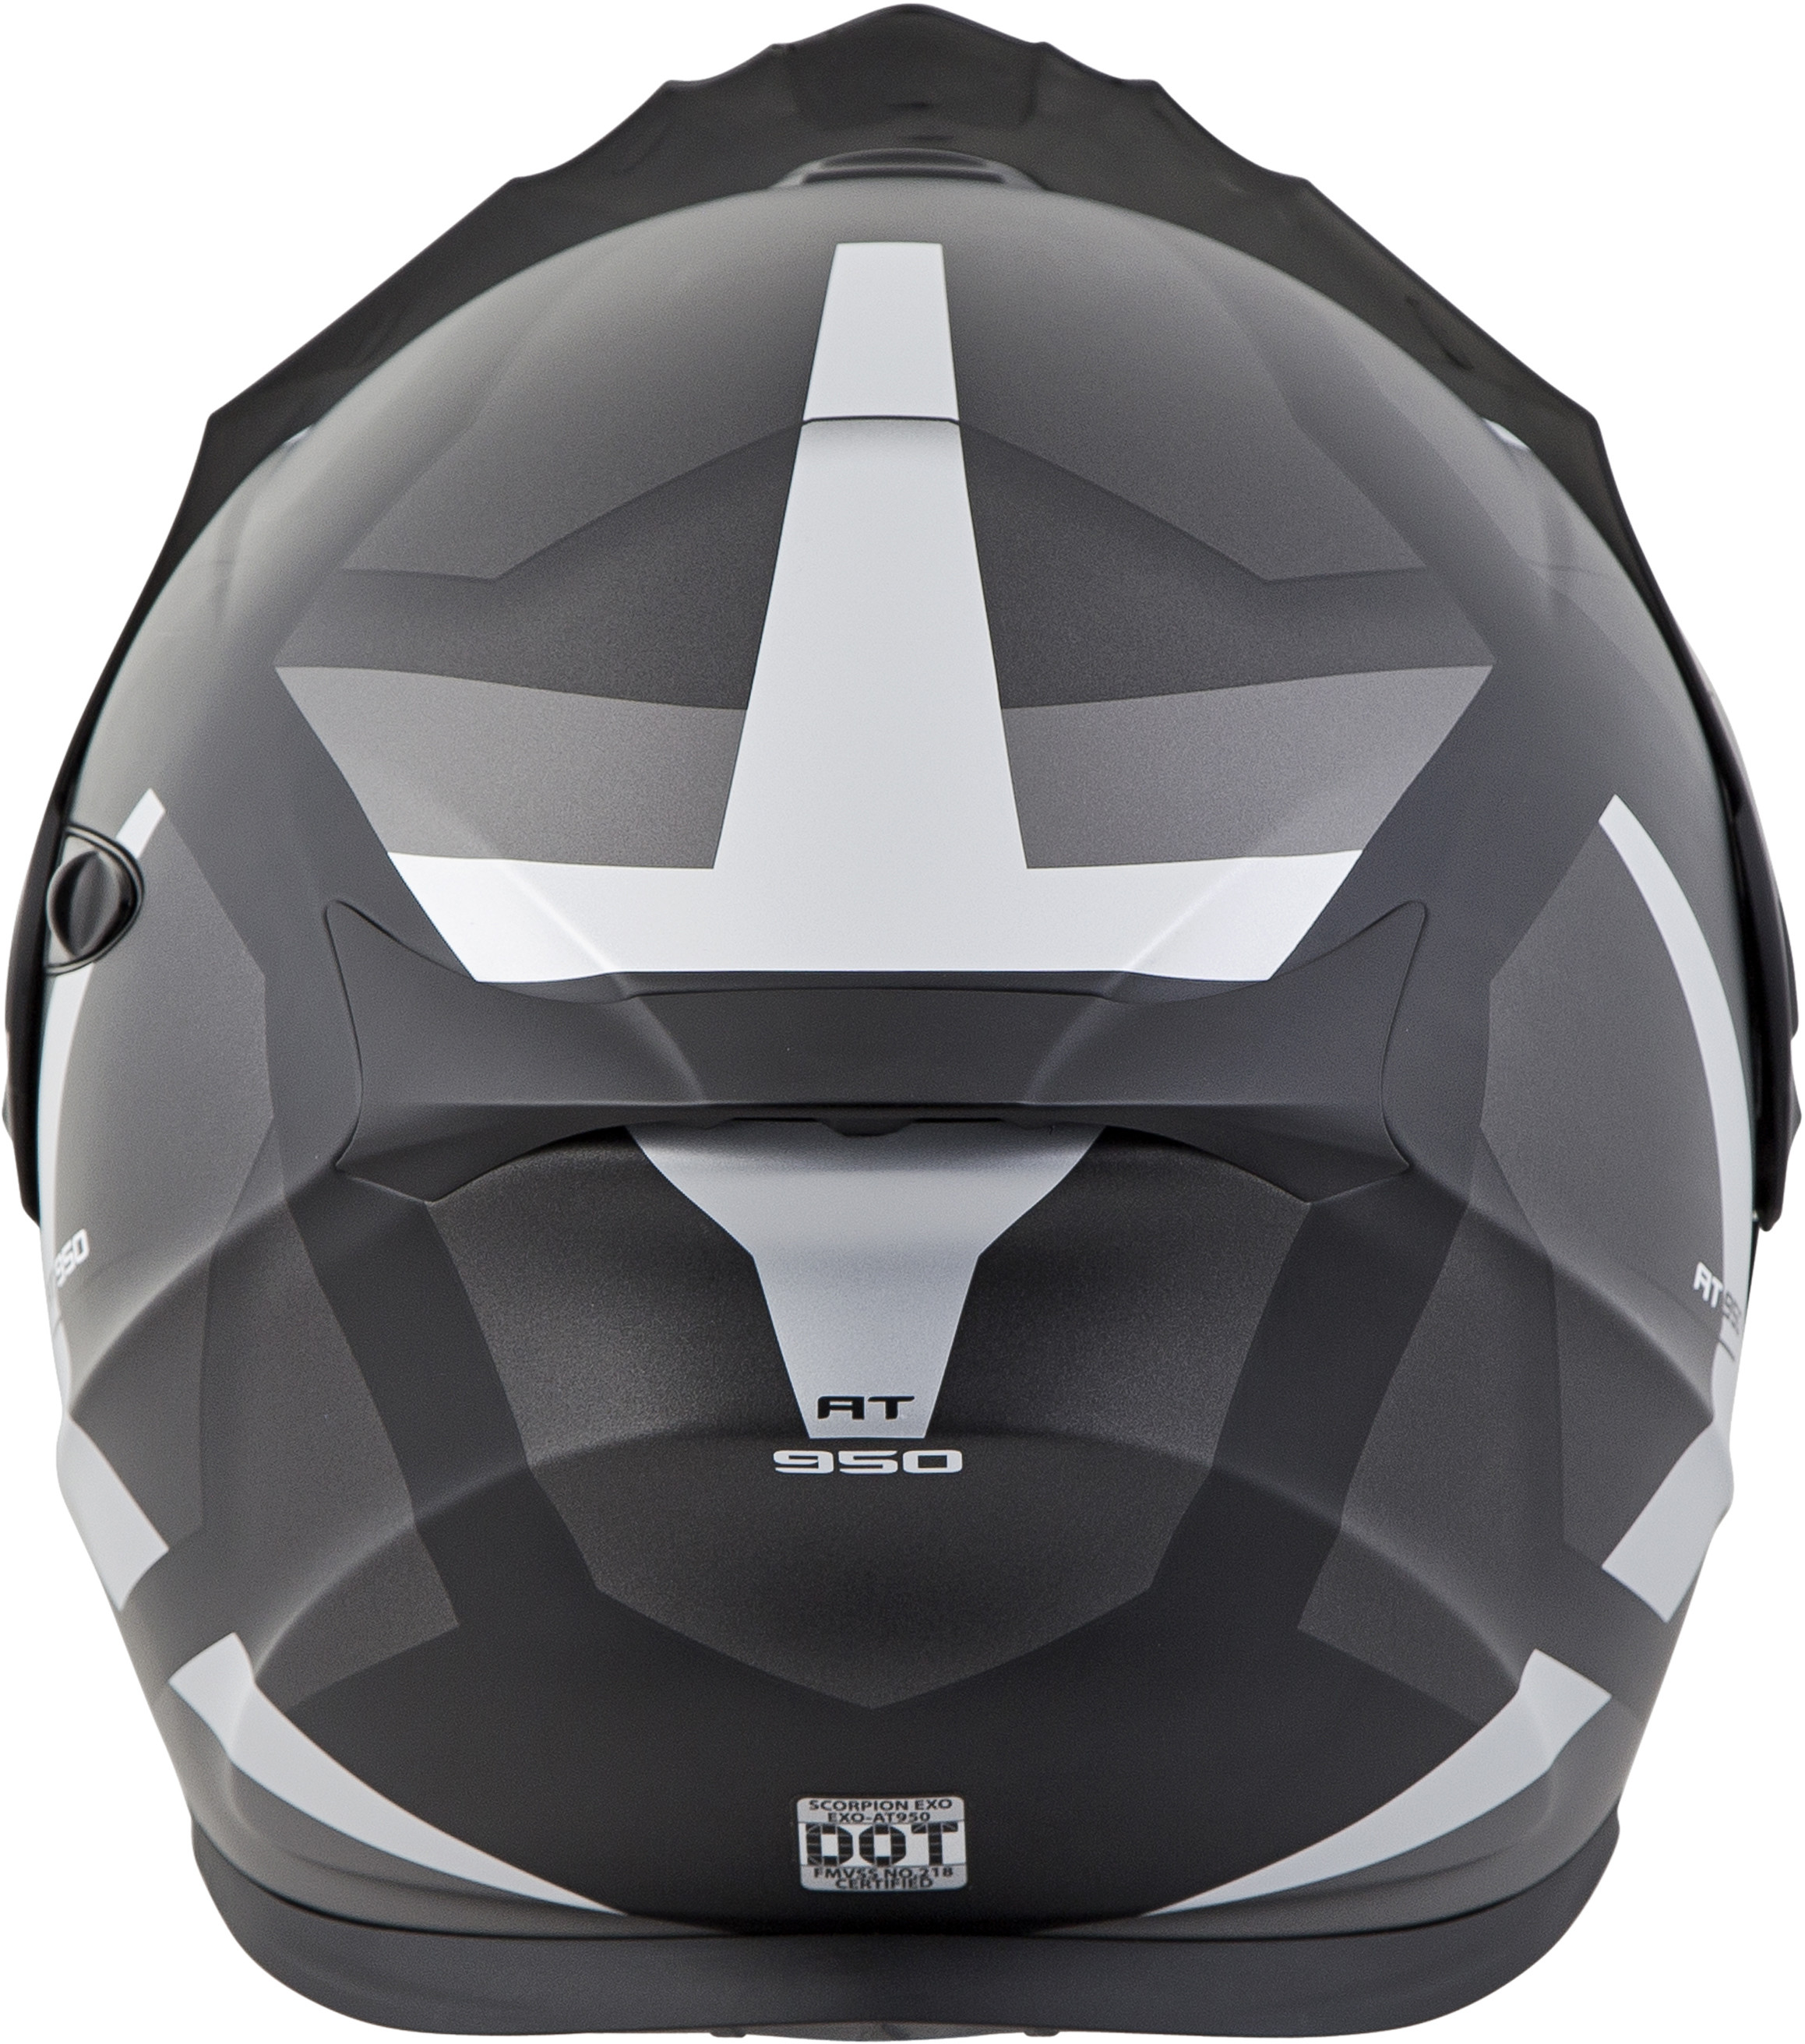 for-Scorpion-Helmet-EXO-AT950-Neocon-Snow-Helmet-with-Dual-Lens-Shield miniature 29